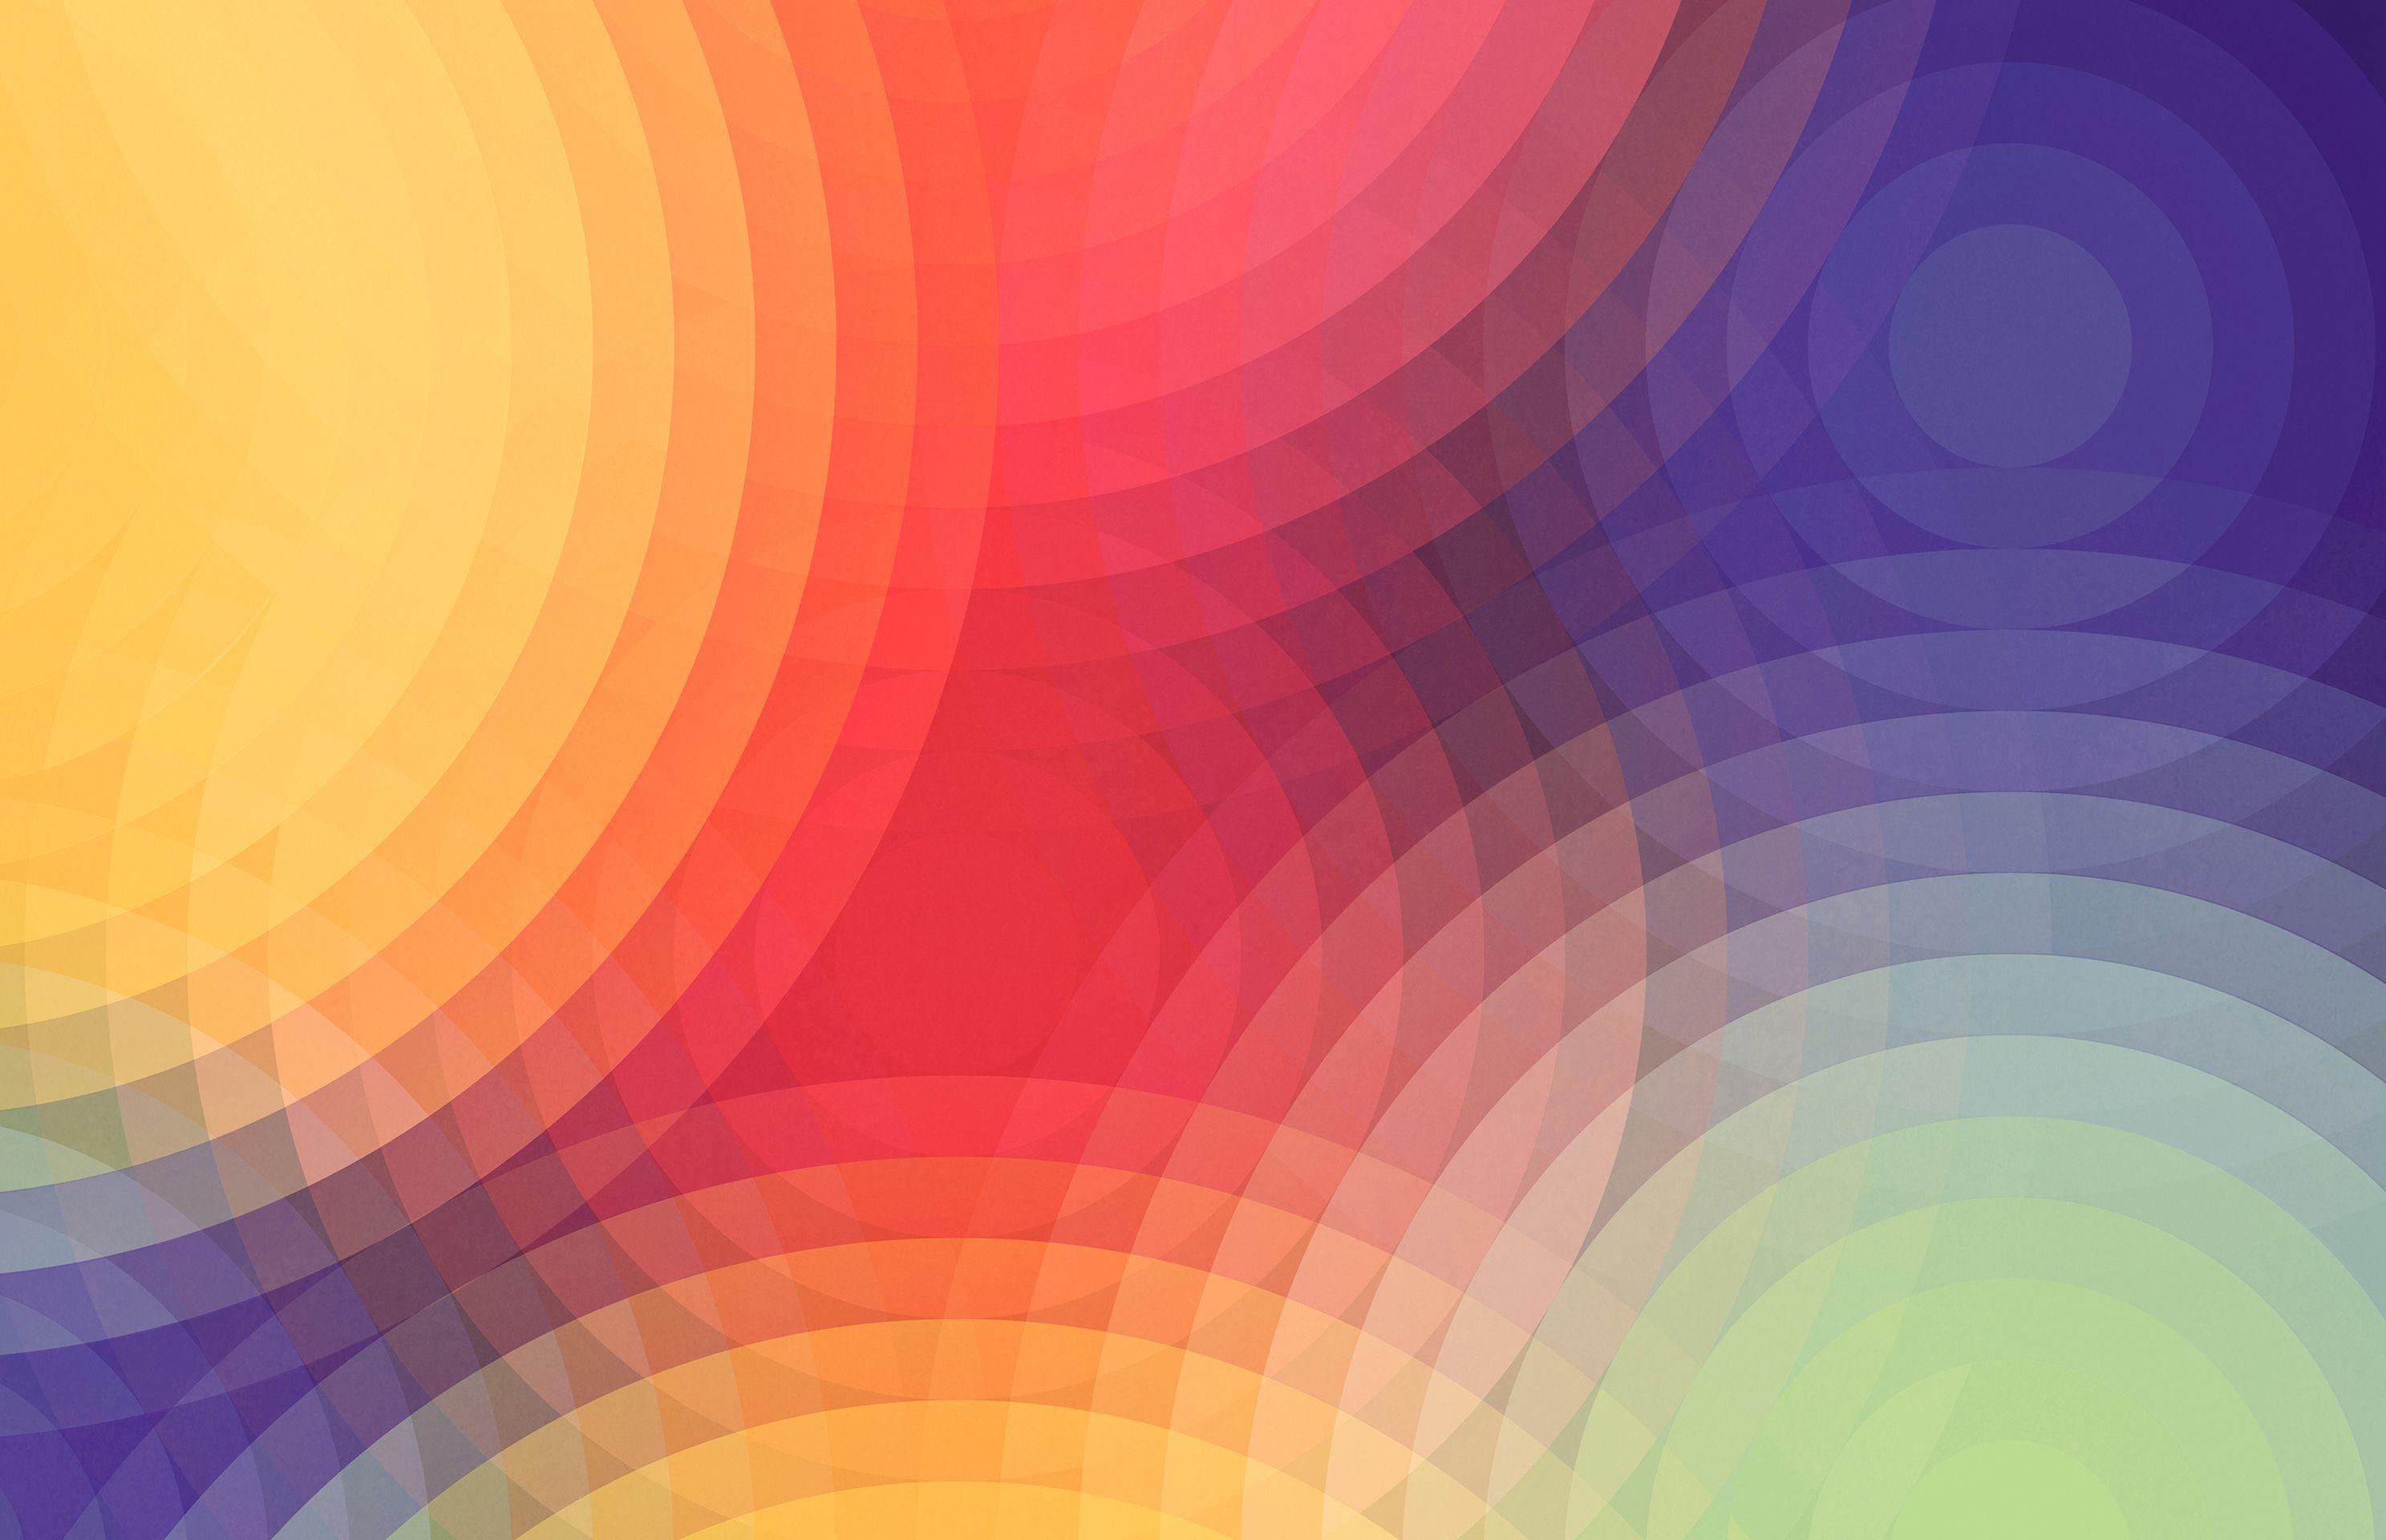 android kitkat nexus wallpaper hd 1080p